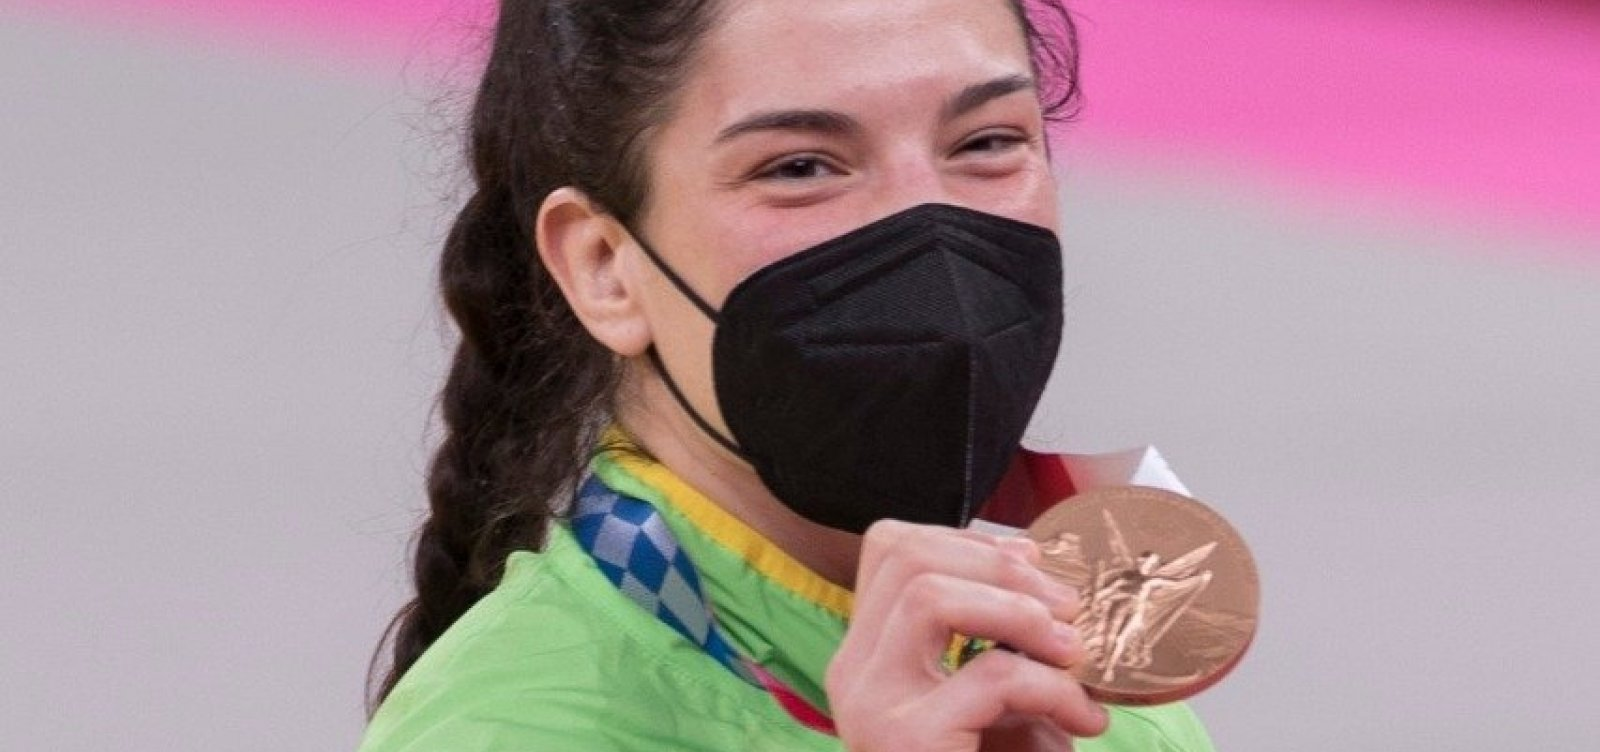 Mayra Aguiar sobe ao pódio e garante bronze no judô